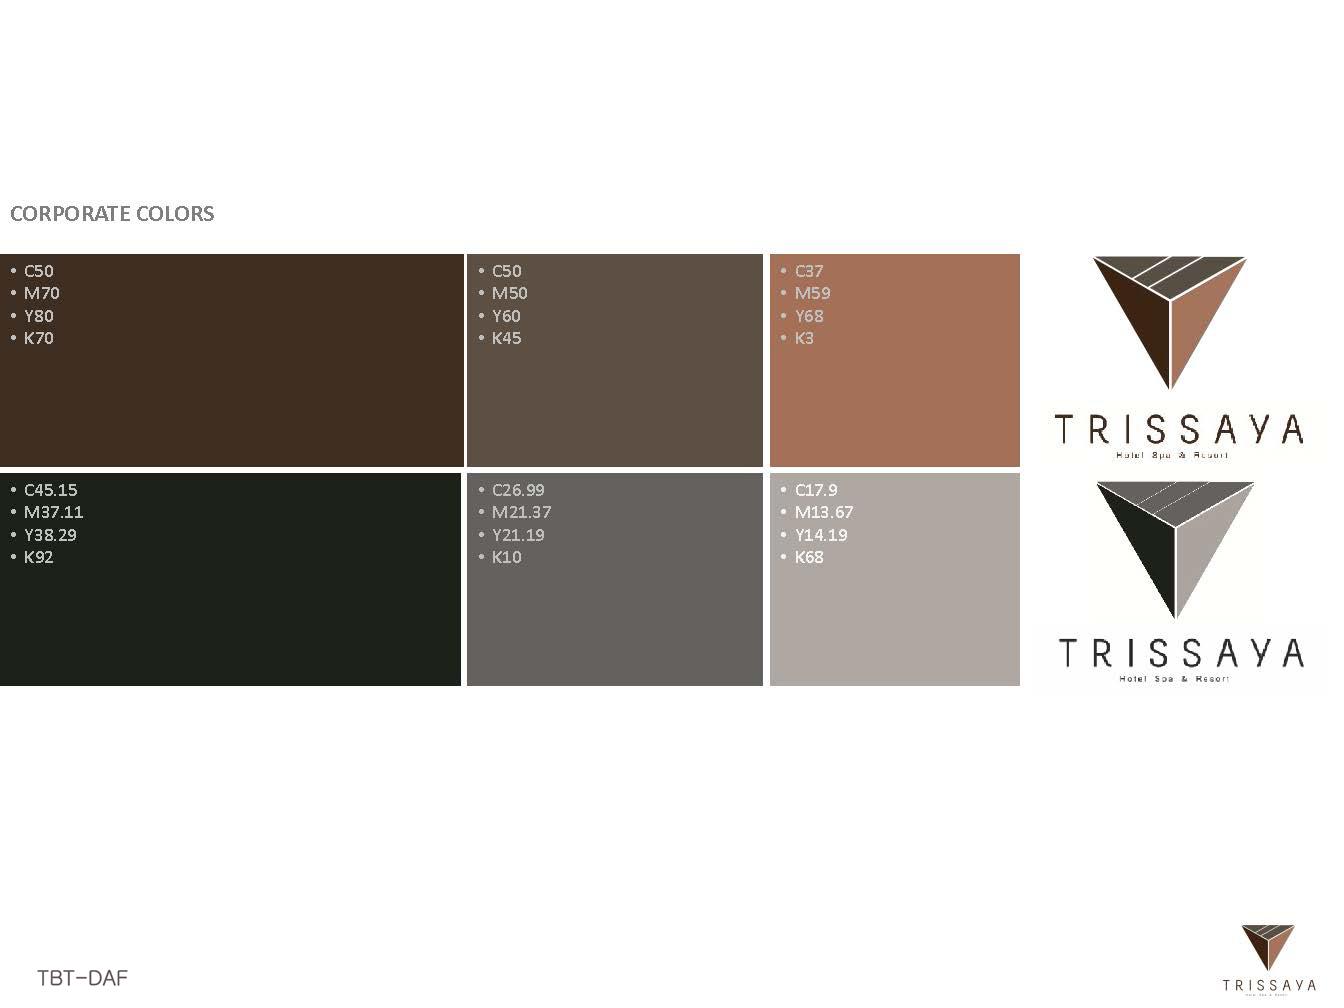 TBT-DAF TRISSAYA 5